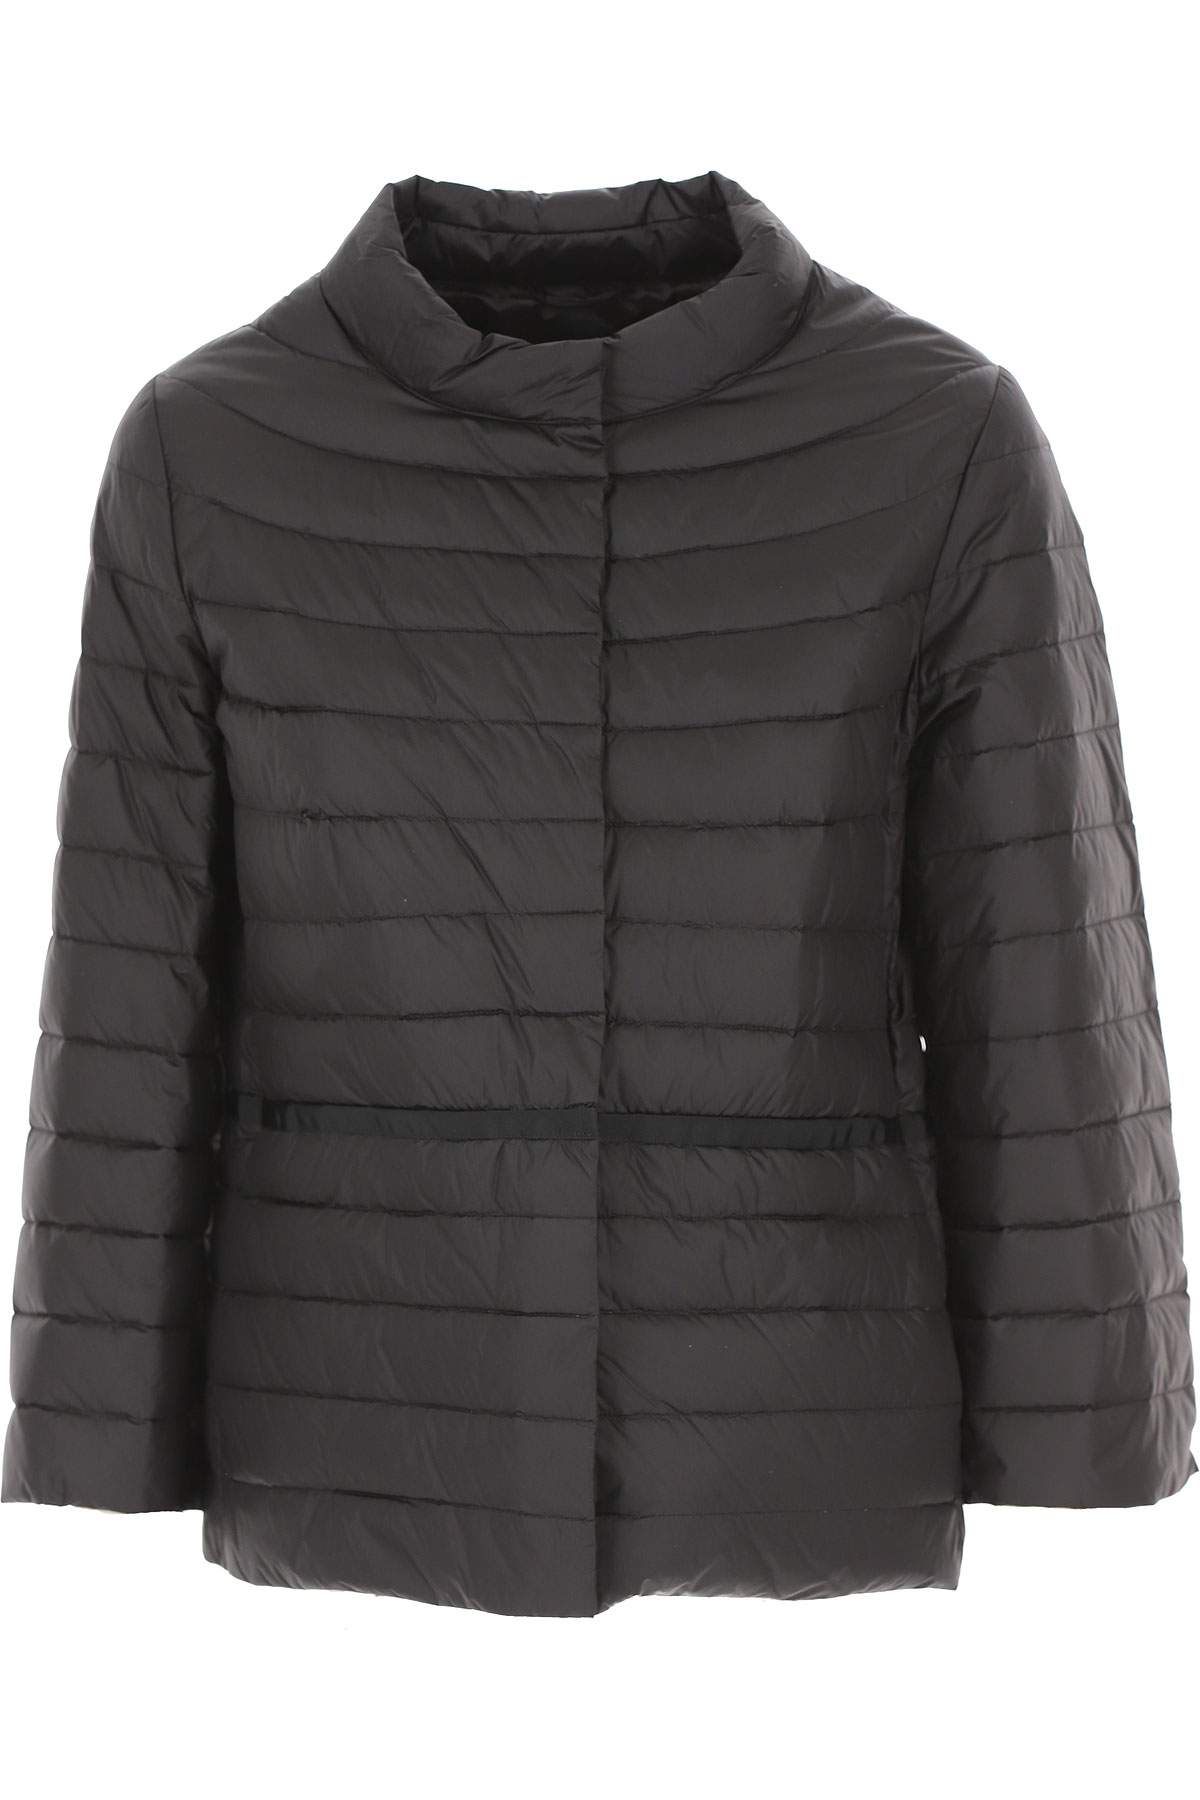 ADD Down Jacket for Women, Puffer Ski Jacket On Sale, Black, polyamide, 2019, 10 12 14 6 8